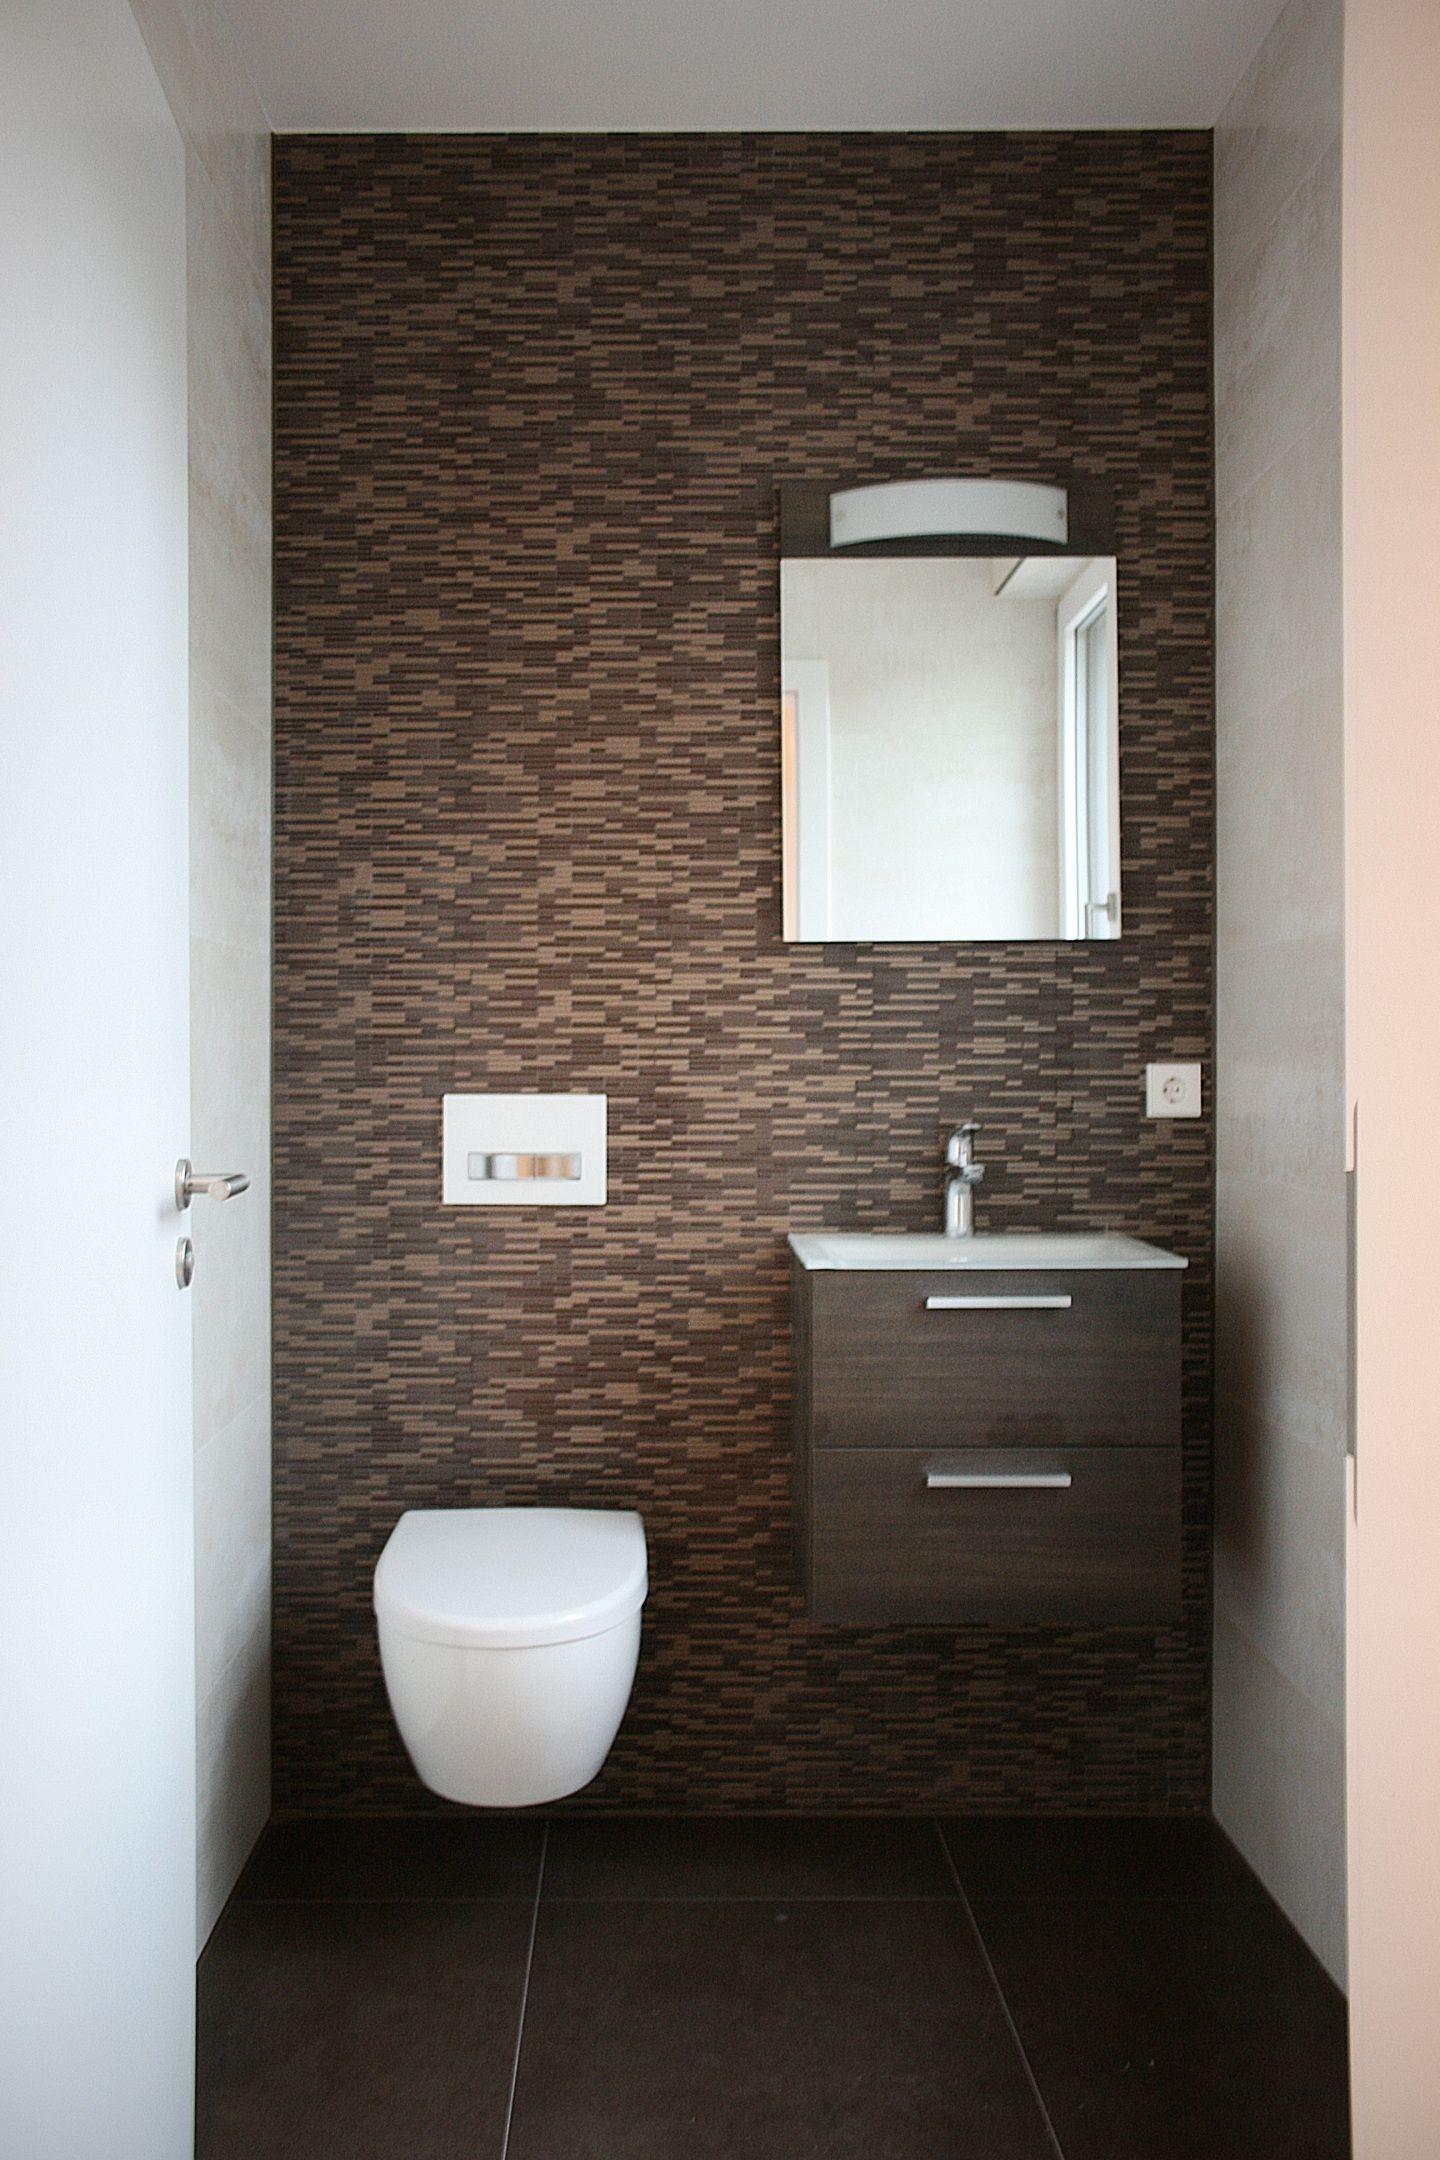 kleines wc gro e wirkung. Black Bedroom Furniture Sets. Home Design Ideas